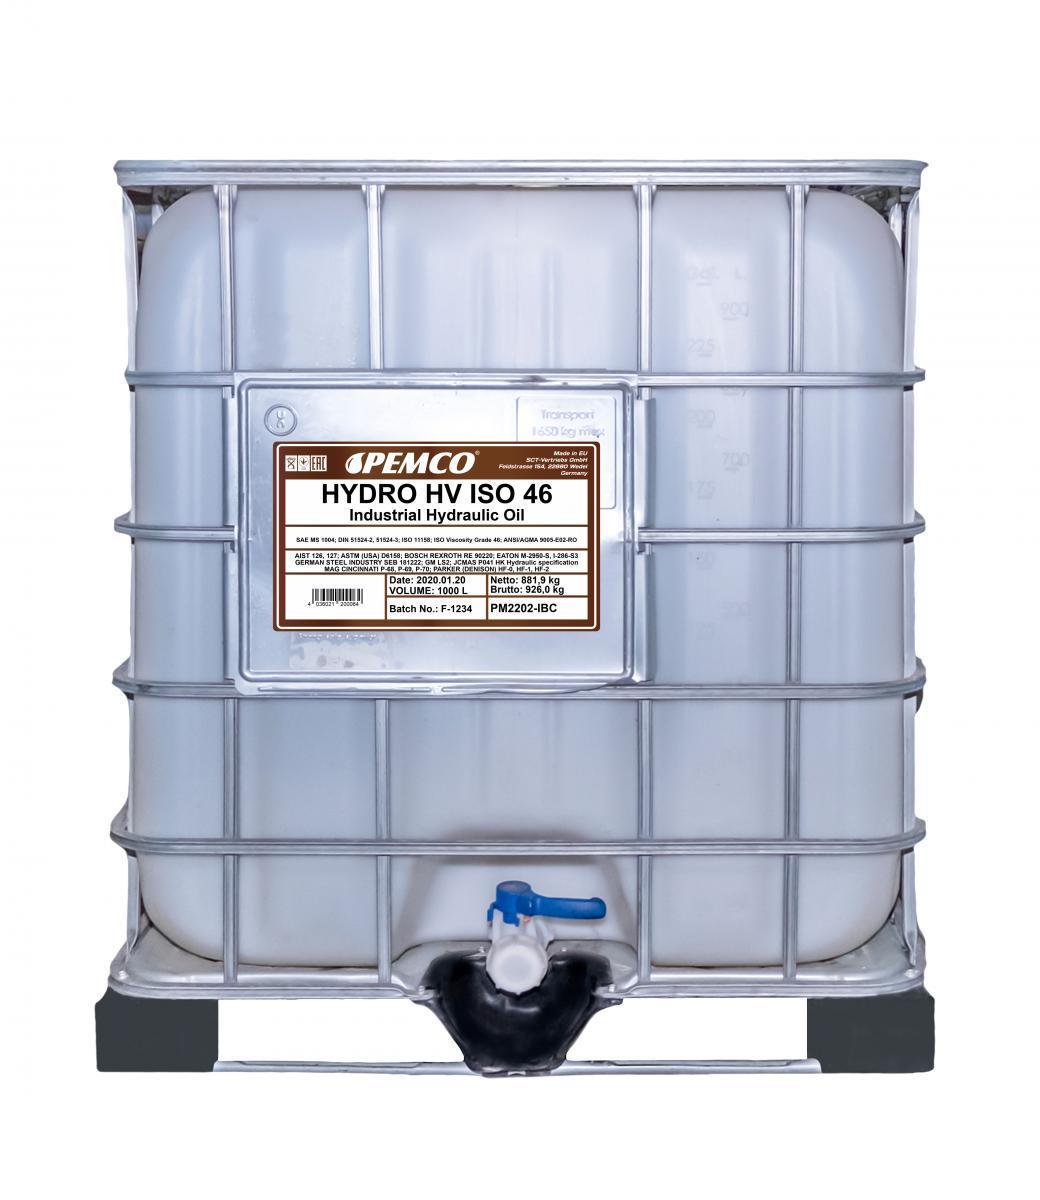 Compre PEMCO Óleo hidráulico PM2202-IBC caminhonete